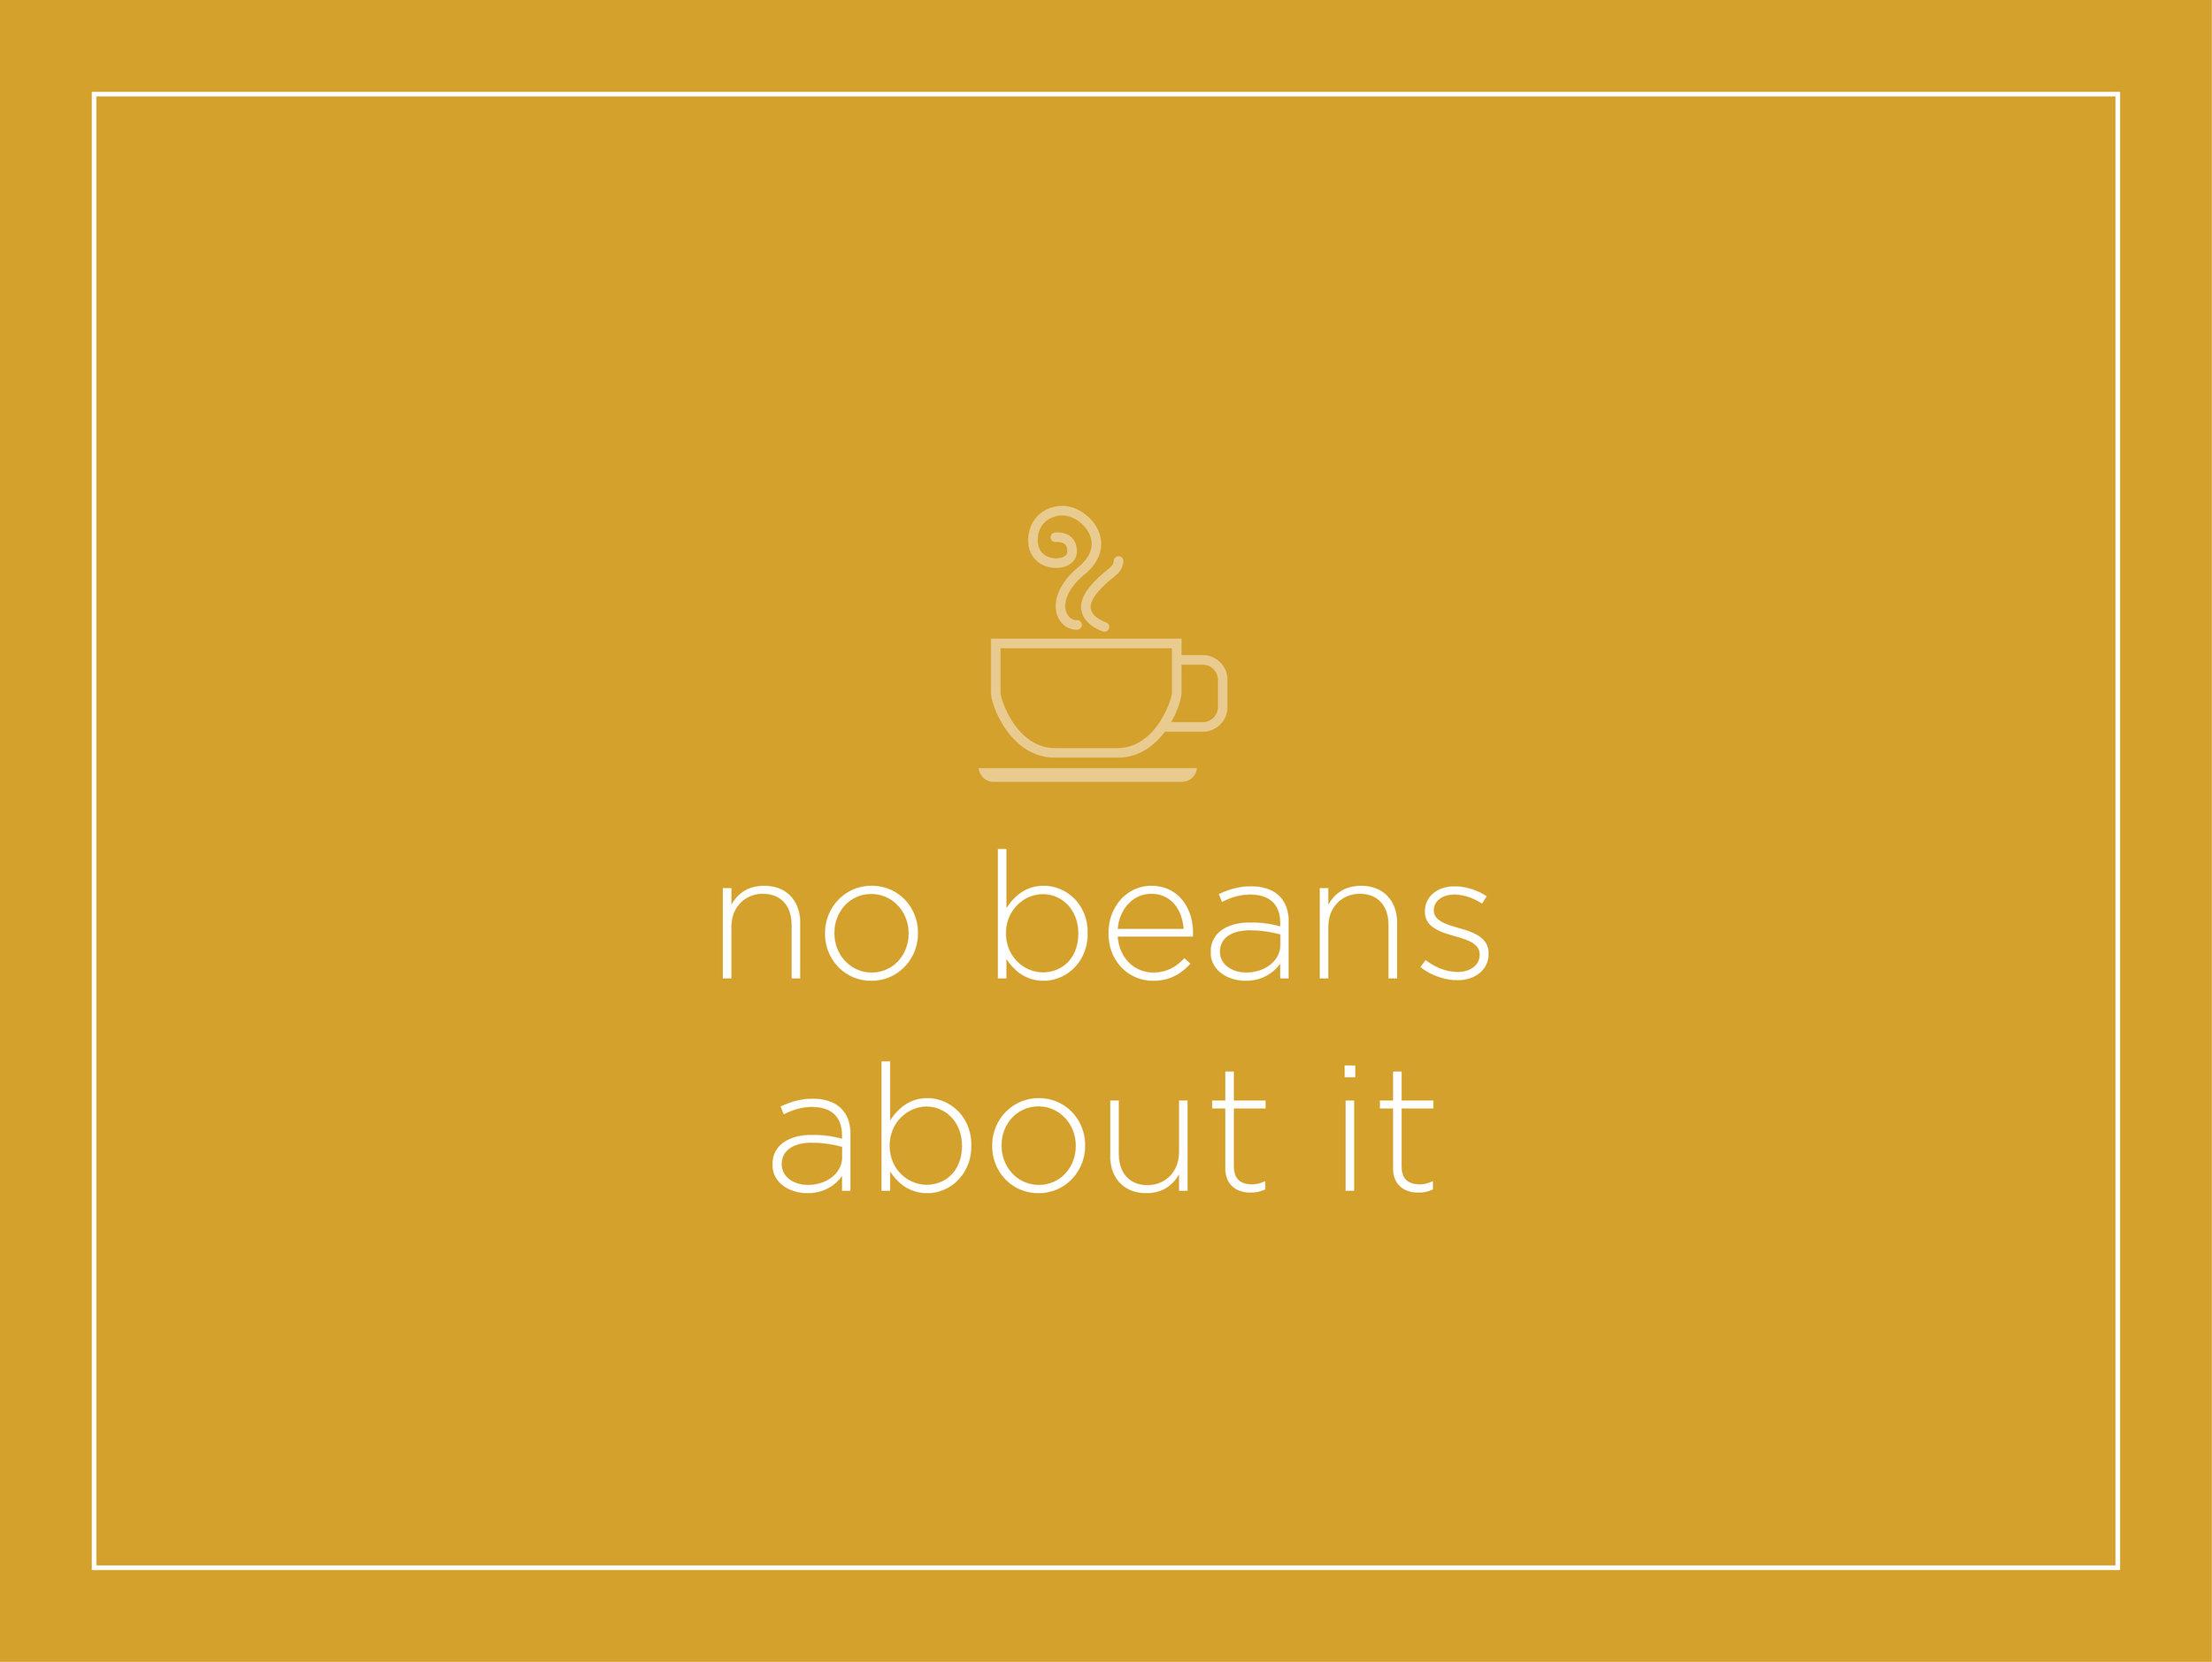 - [coffee alternatives]hot tea: 1.45 | 1.65 | 1.85hot chocolate: 2.50 | 3.00 | 3.50steamer: 2.50 | 3.00 | 3.50chai: 3.50 | 4.00 | 4.50freshly brewed iced tea: 1.50 |1.75 | 2.00bottled beverages: 1.50strawberry lemonade: 2.25 | 2.50 | 2.75